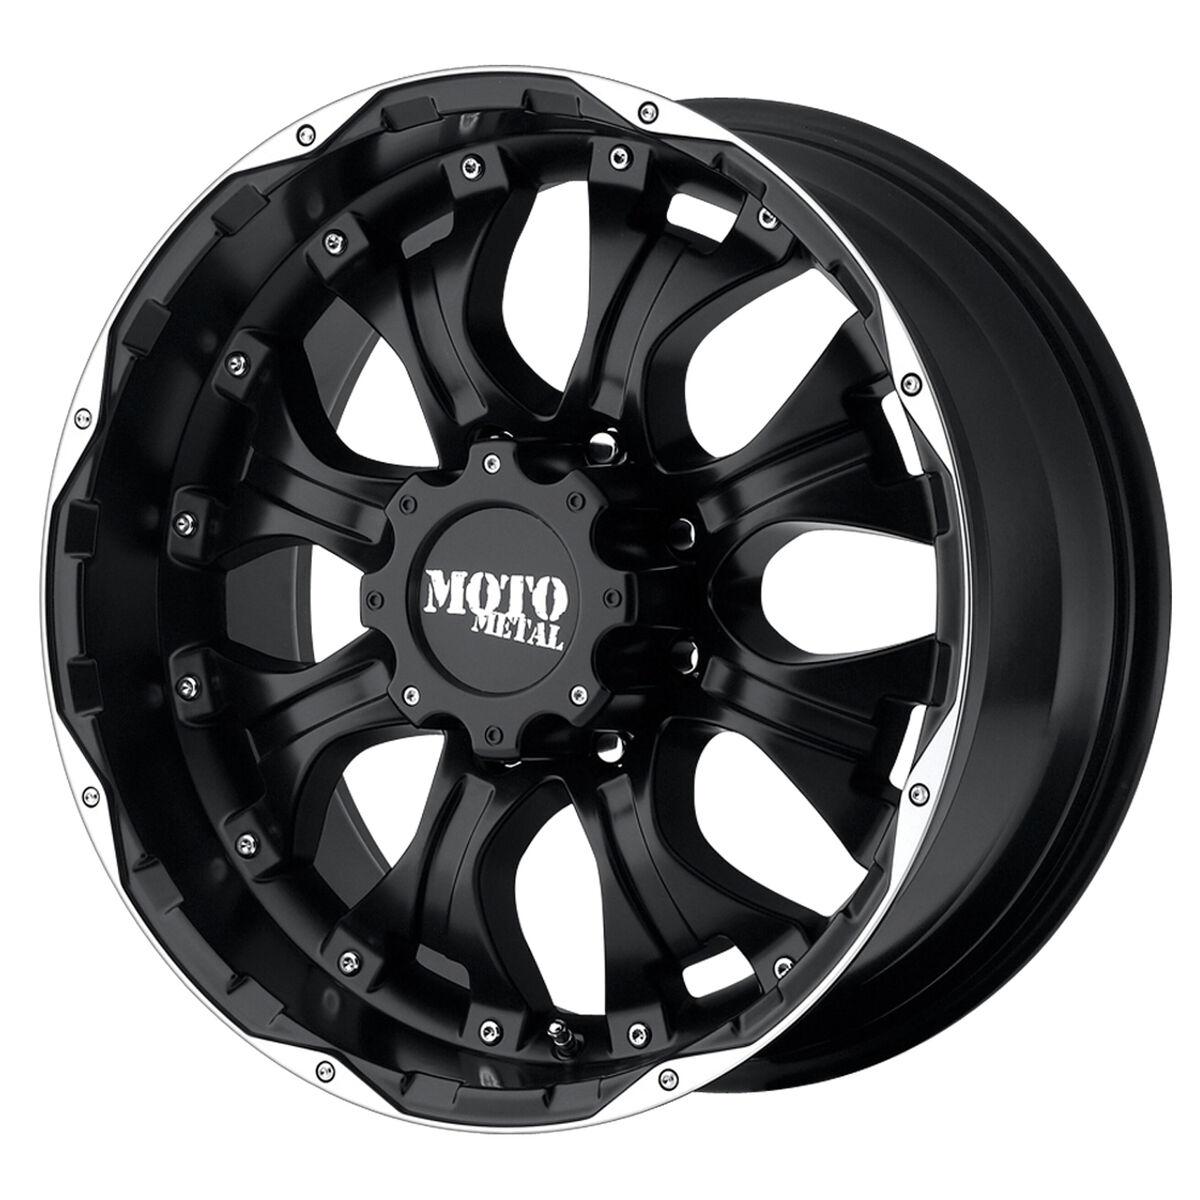 20 inch Black wheels rim MOTO METAL 959 Chevy Gmc Dodge 2500 3500 8